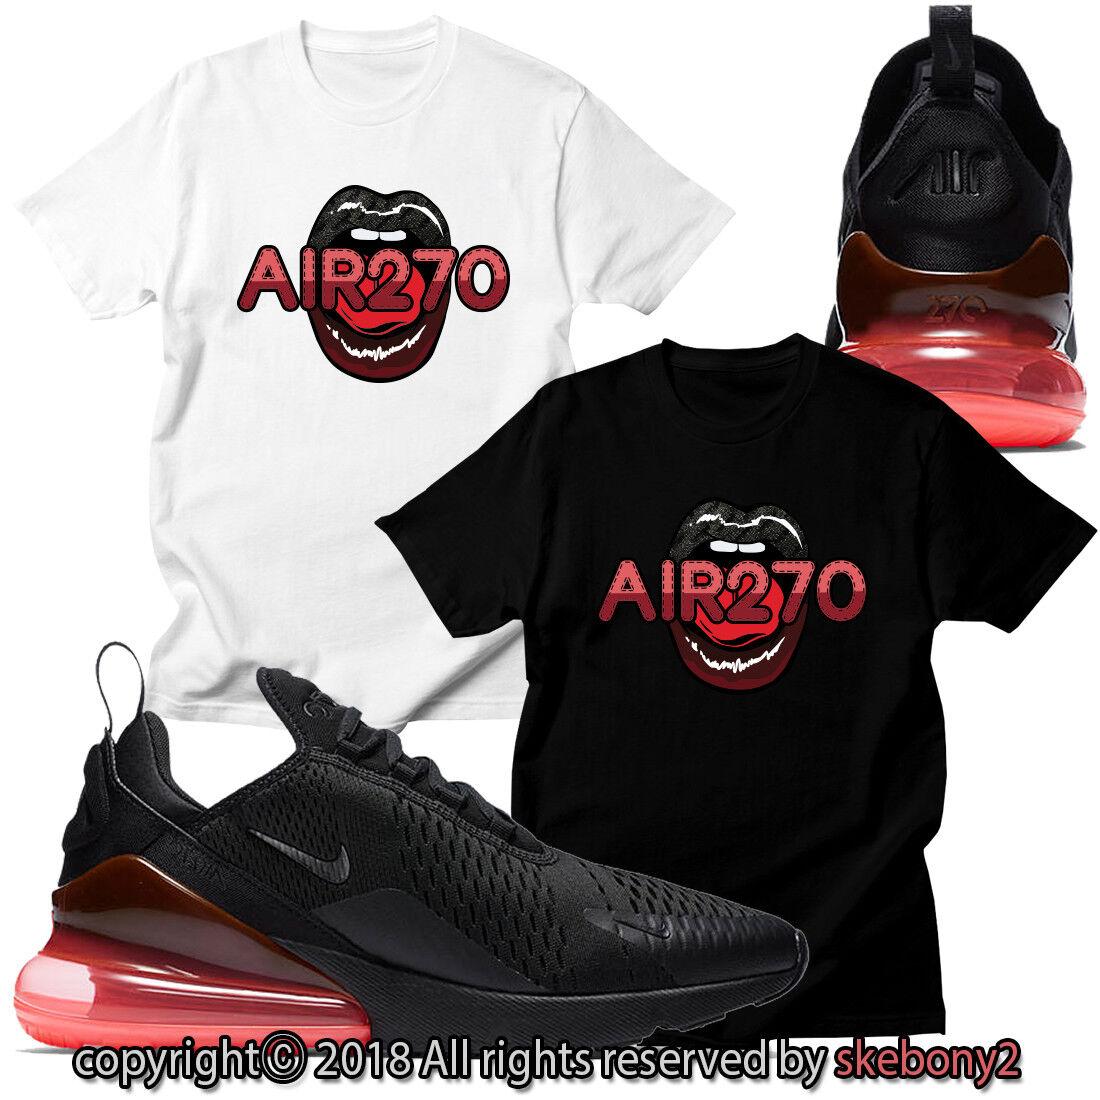 ÚJ CUSTOM T-SHIRT, amely megfelel Nike Air Max 270 BLACK / HOT PUNCH AM270 1-7-10